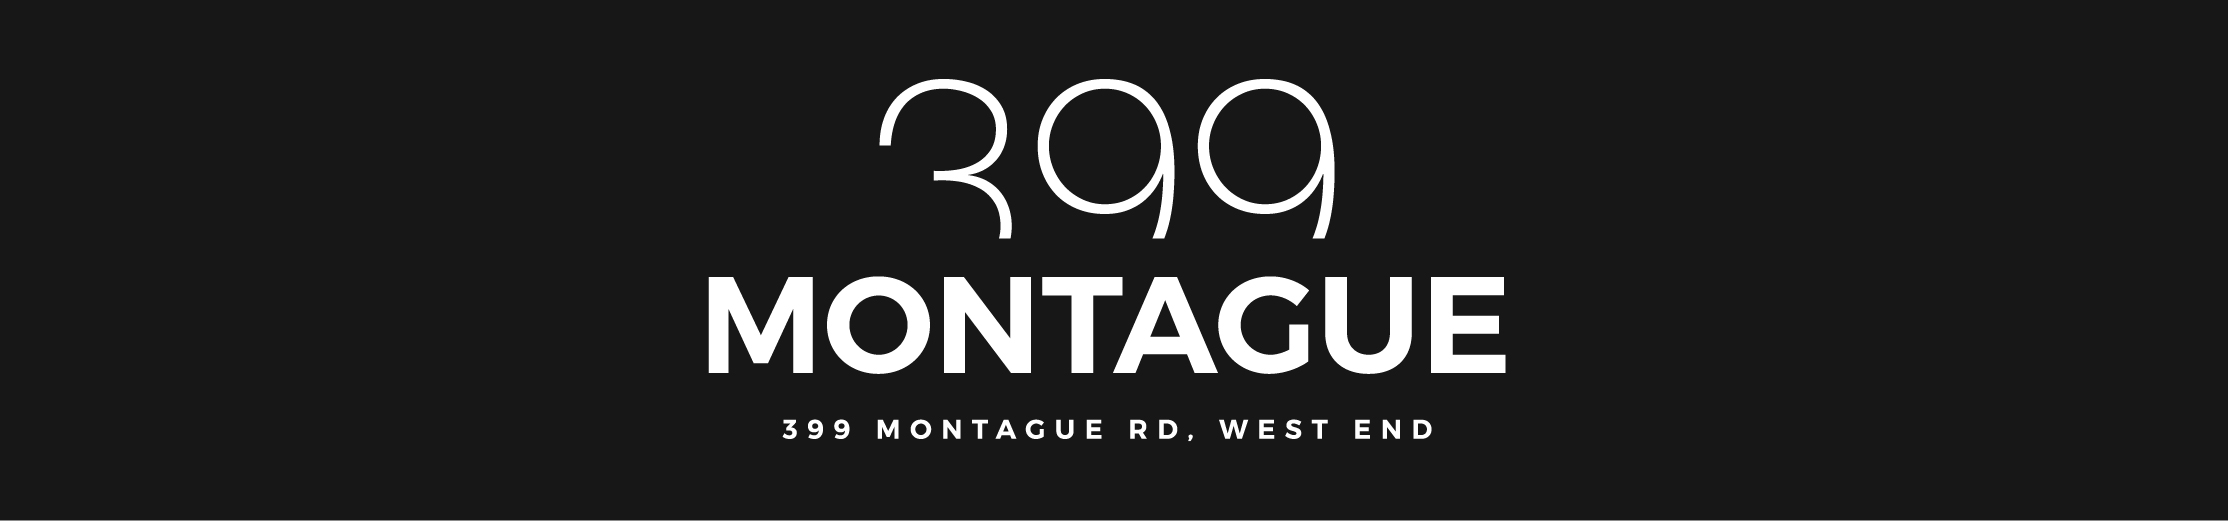 399 Montague Logo Header.jpg